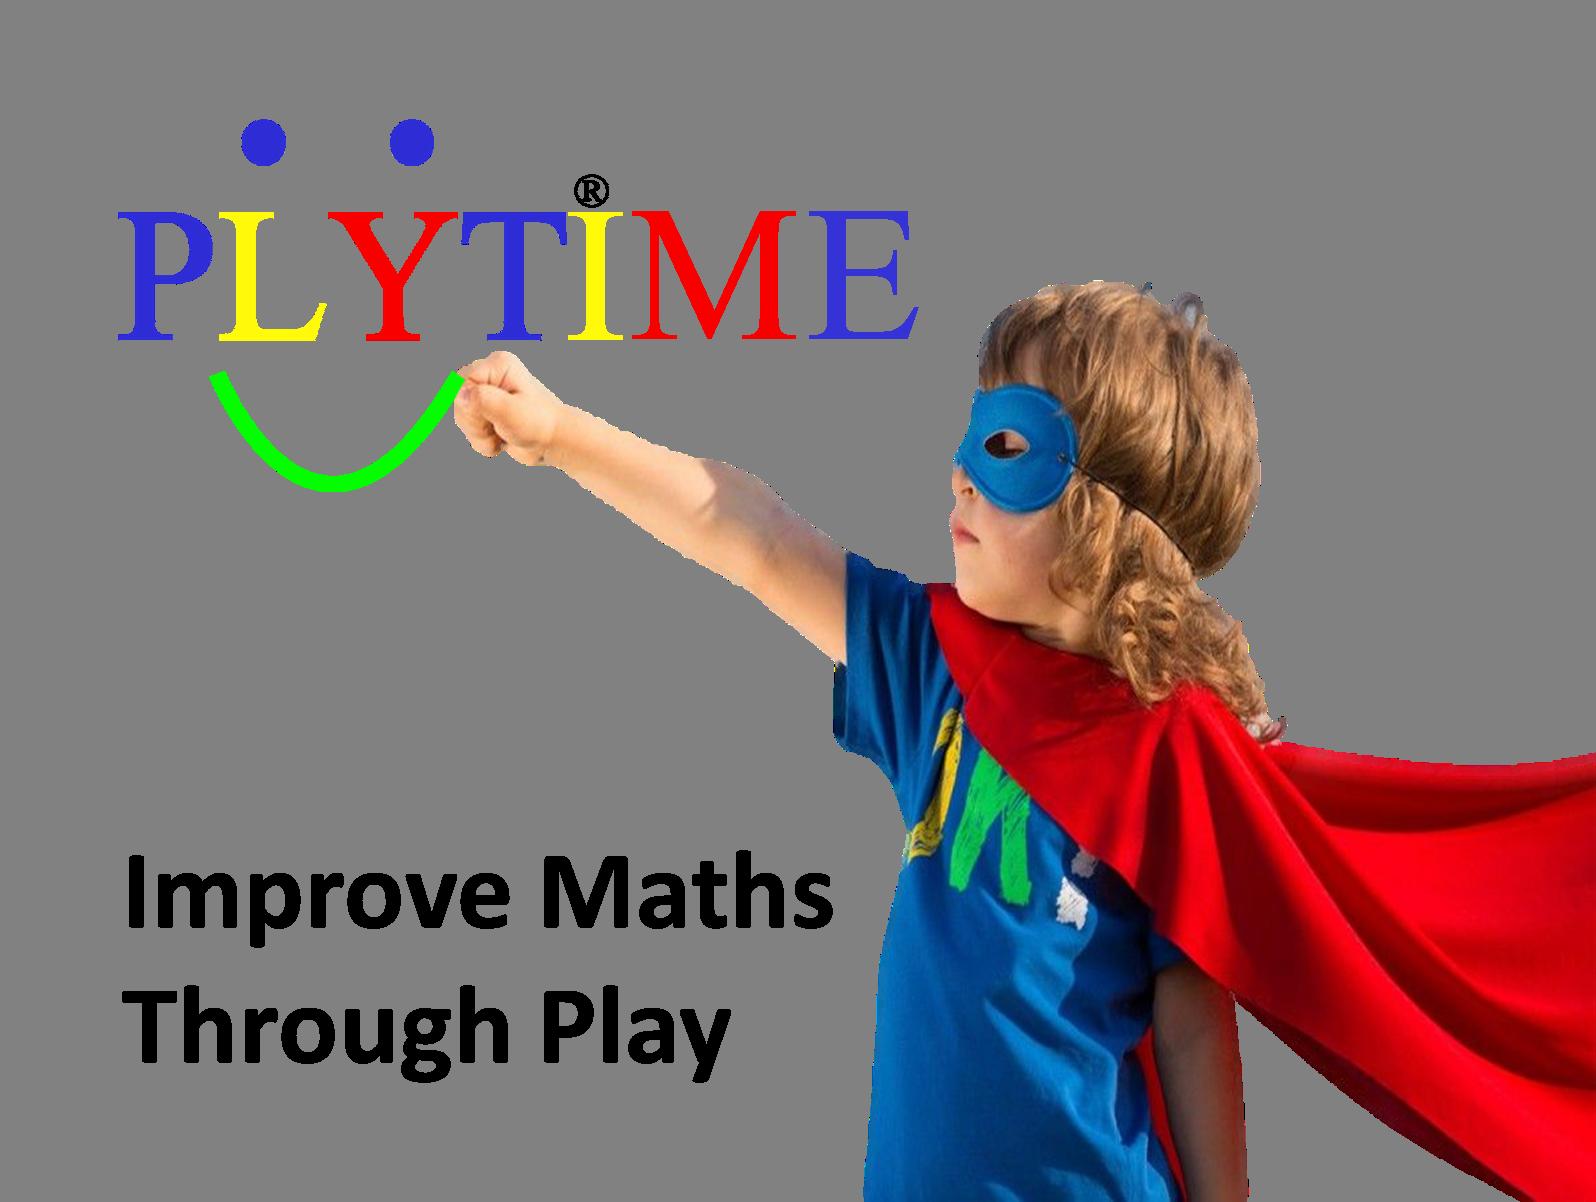 PLYTIME Improve maths through play